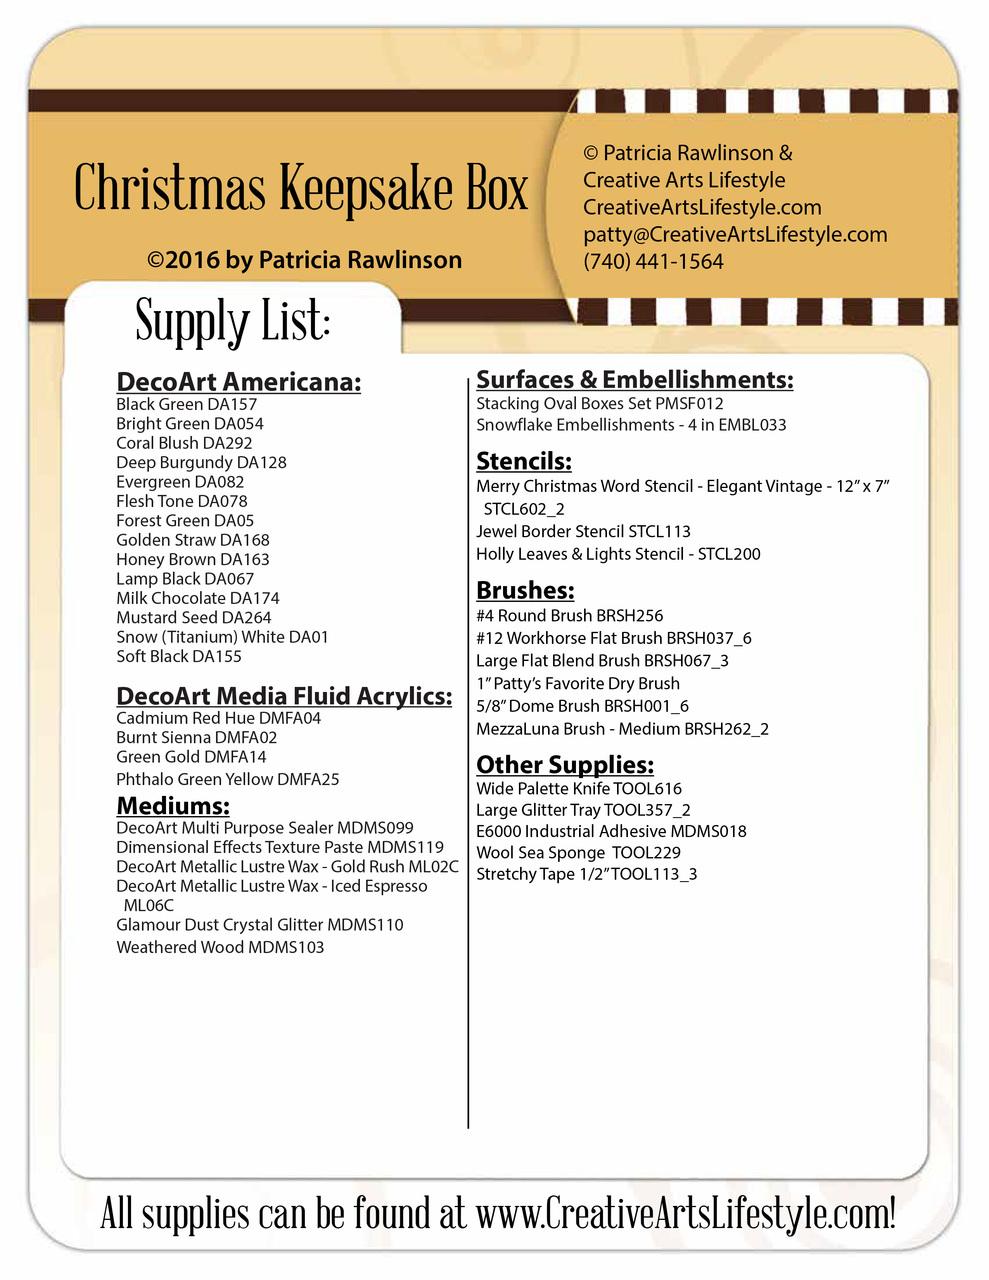 Christmas Keepsake Box Pattern Packet - Patricia Rawlinson